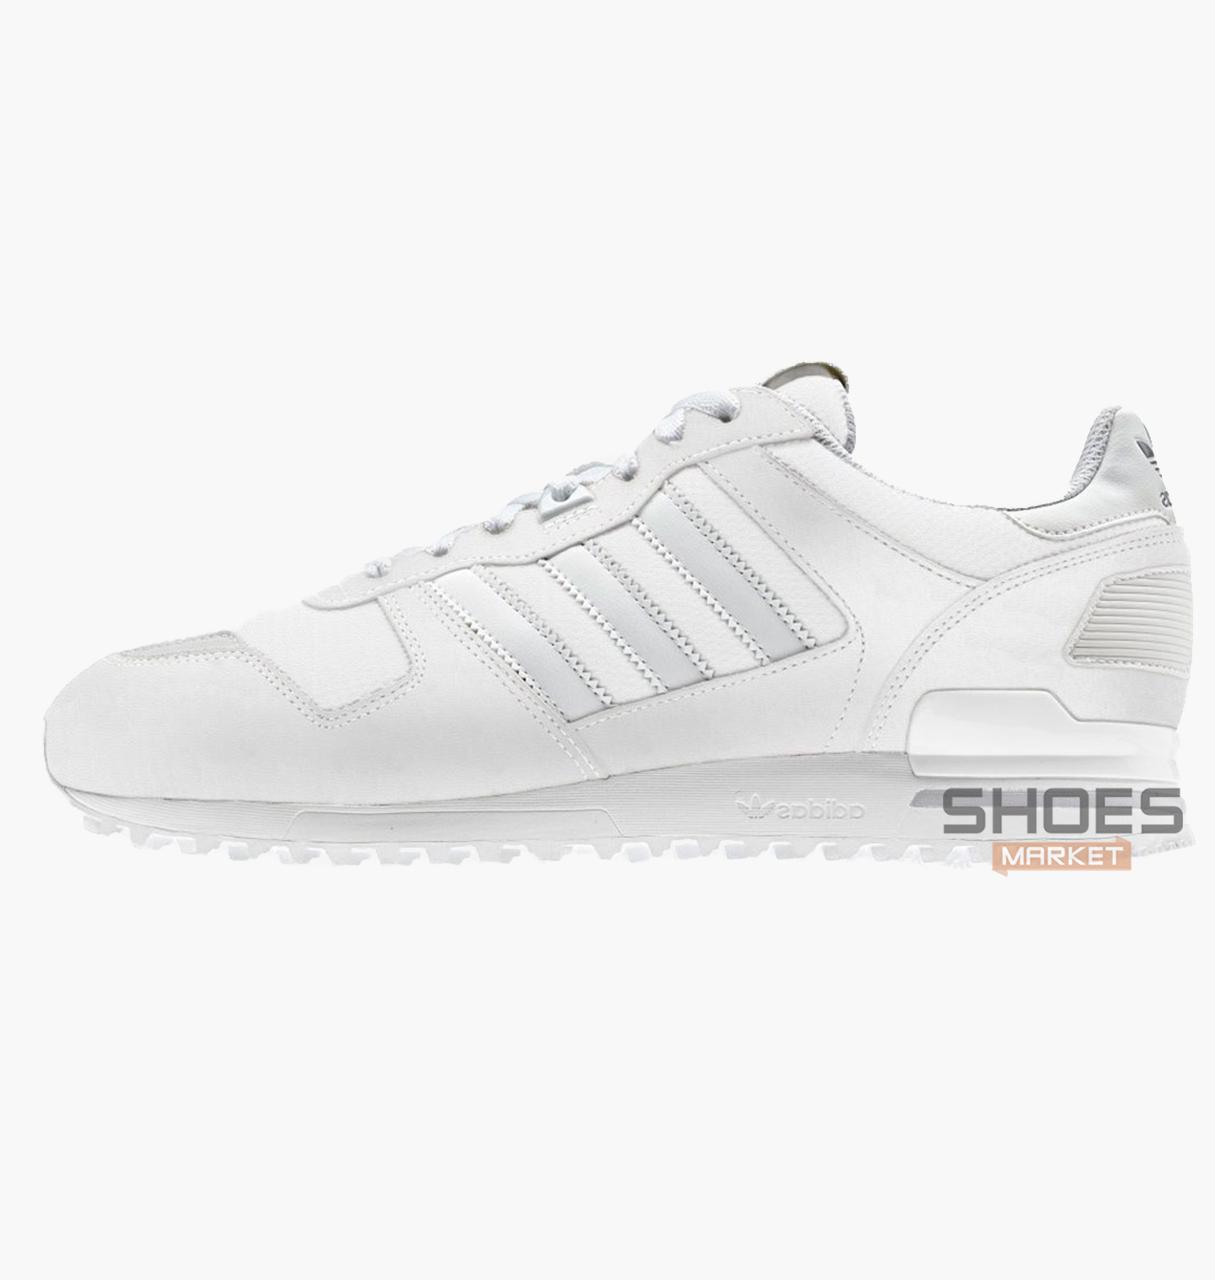 Мужские кроссовки  Adidas ZX 700 White G62110, оригинал